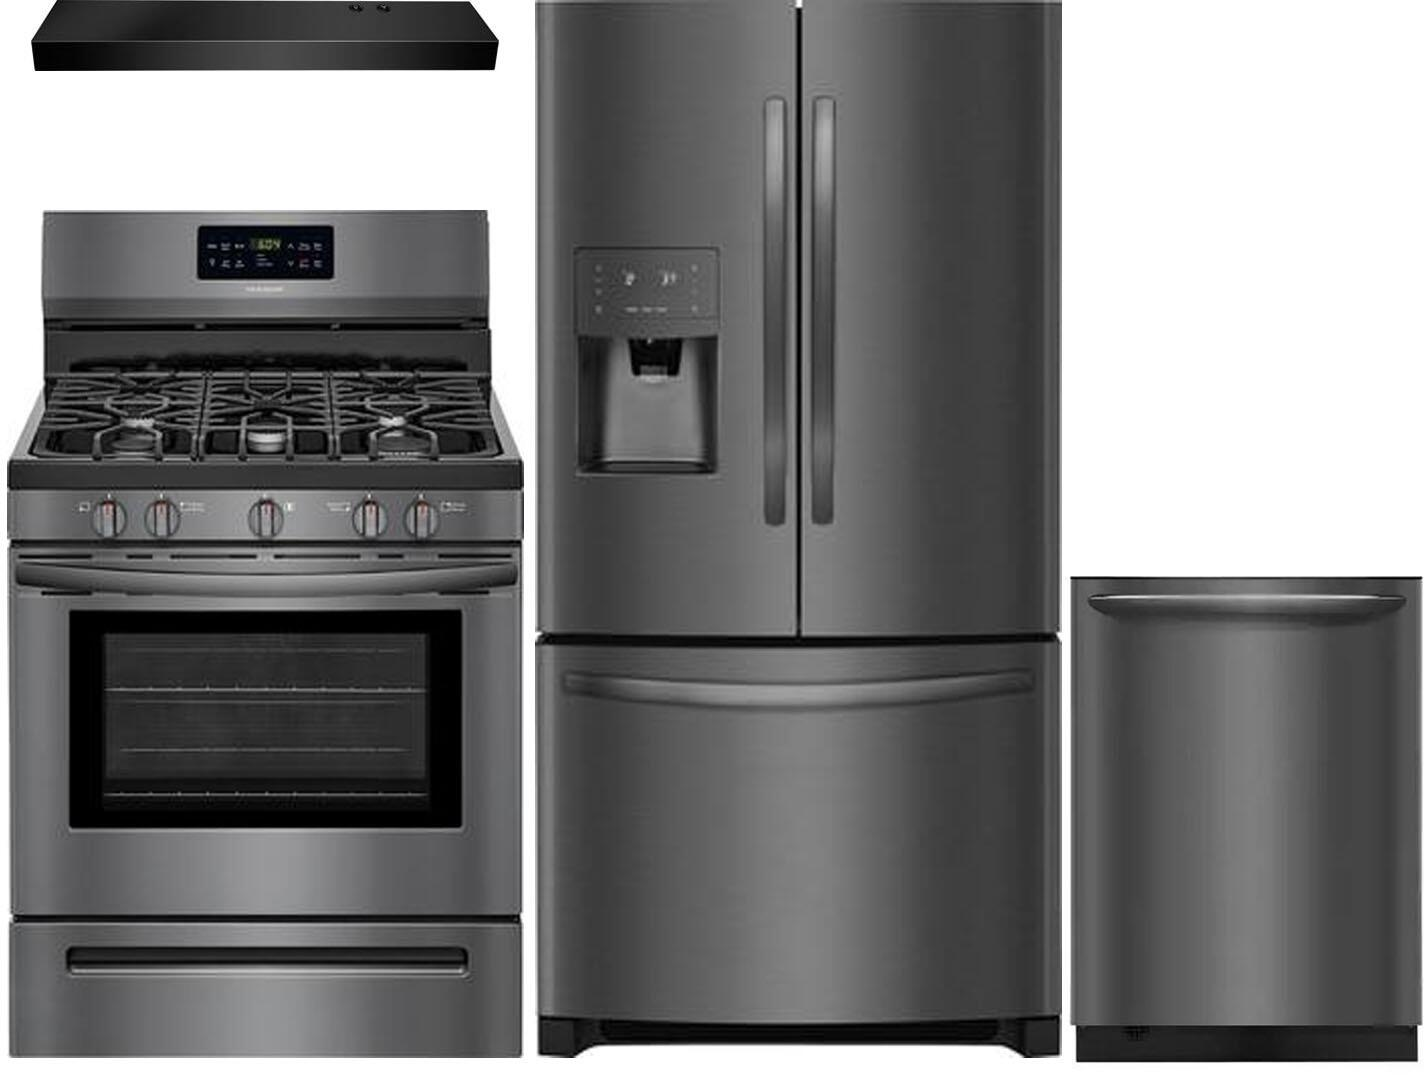 frigidaire kitchen appliances reglaze sink 958095 appliance packages